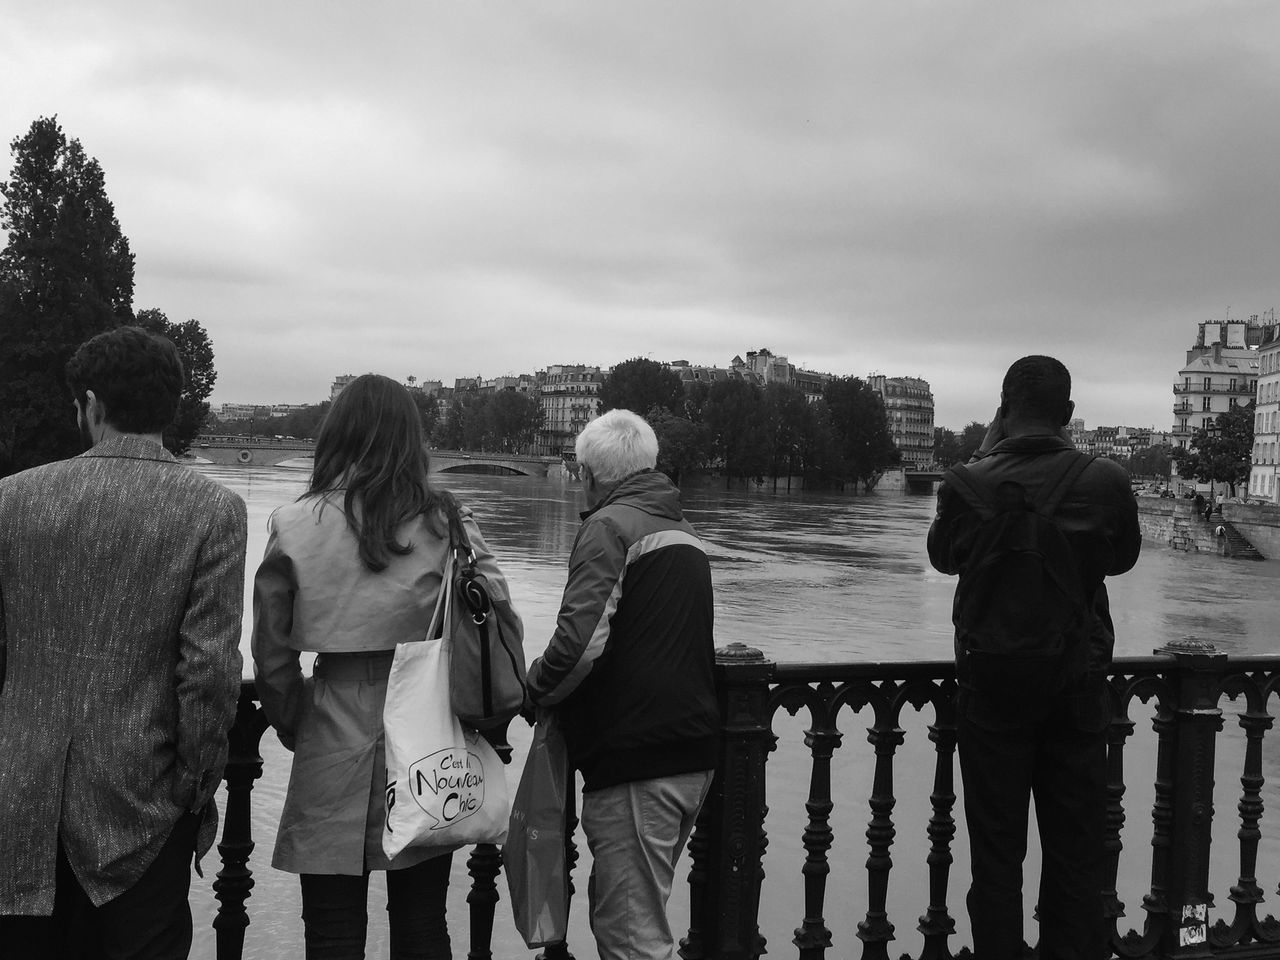 Crue Crue2016 EFENE Efene-studio Efene-studio.com Flood Floods Inondation Inondations Paris Paris ❤ Paris's Flood Paris, France  Quai Quais De Seine Quaisdeseine Seine Seine River The Seine